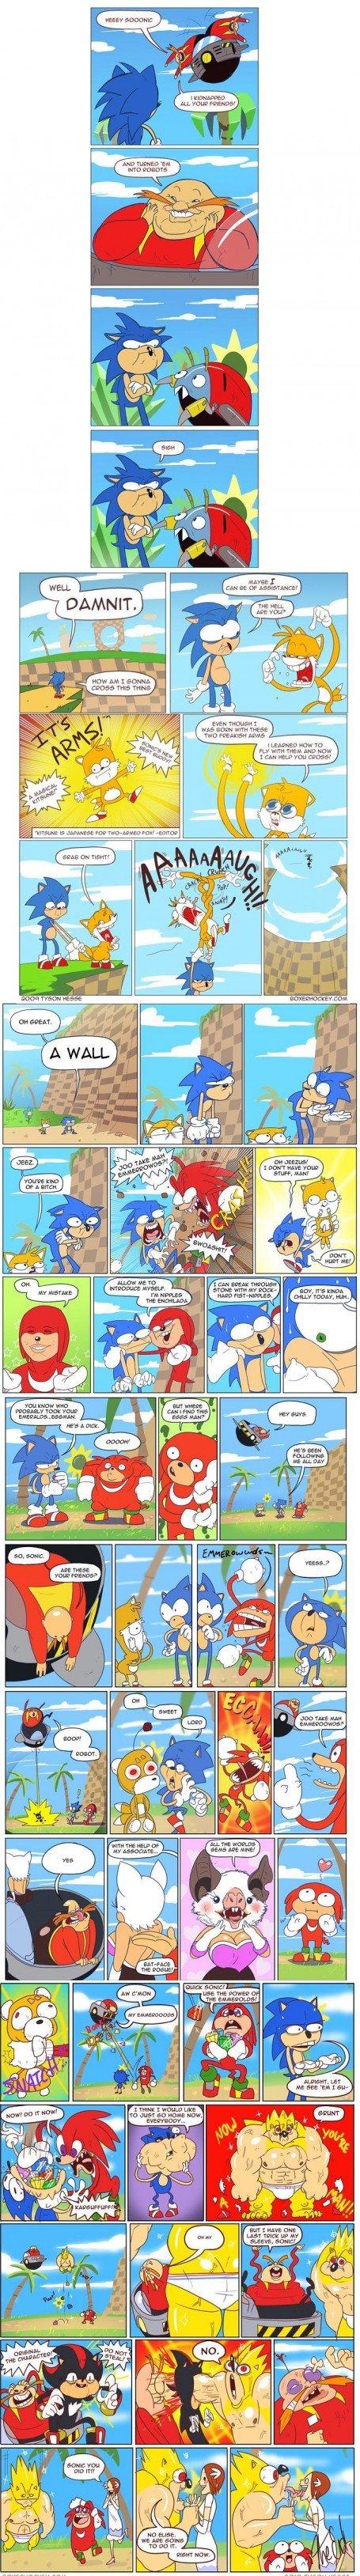 Sonic's adventure. . Hia mm T APE!